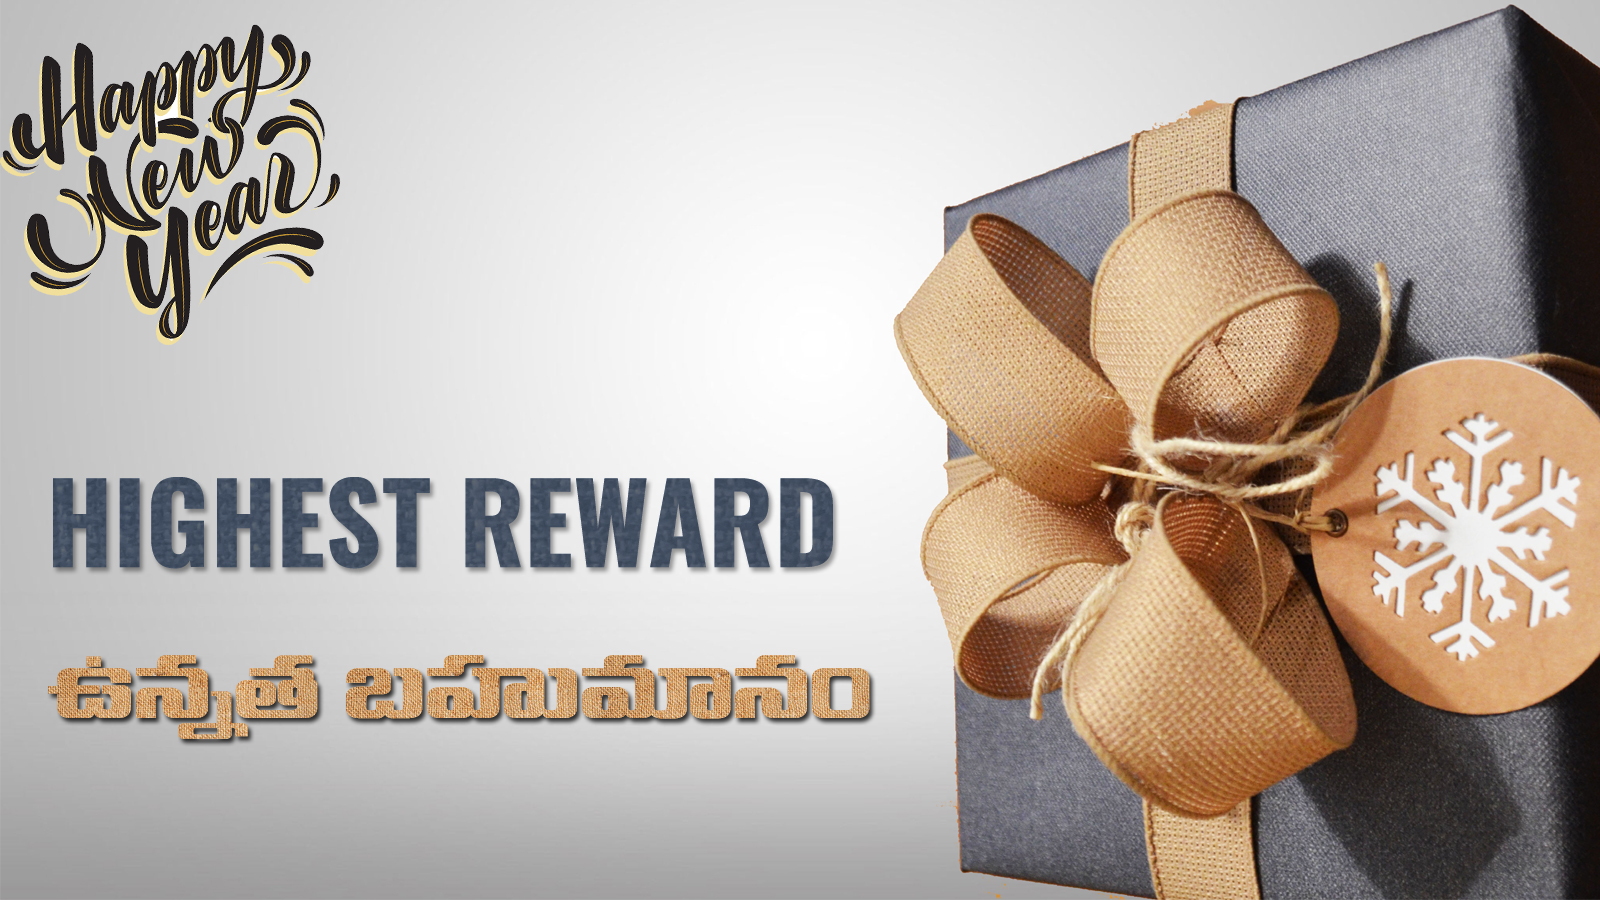 Highest Reward (A286)